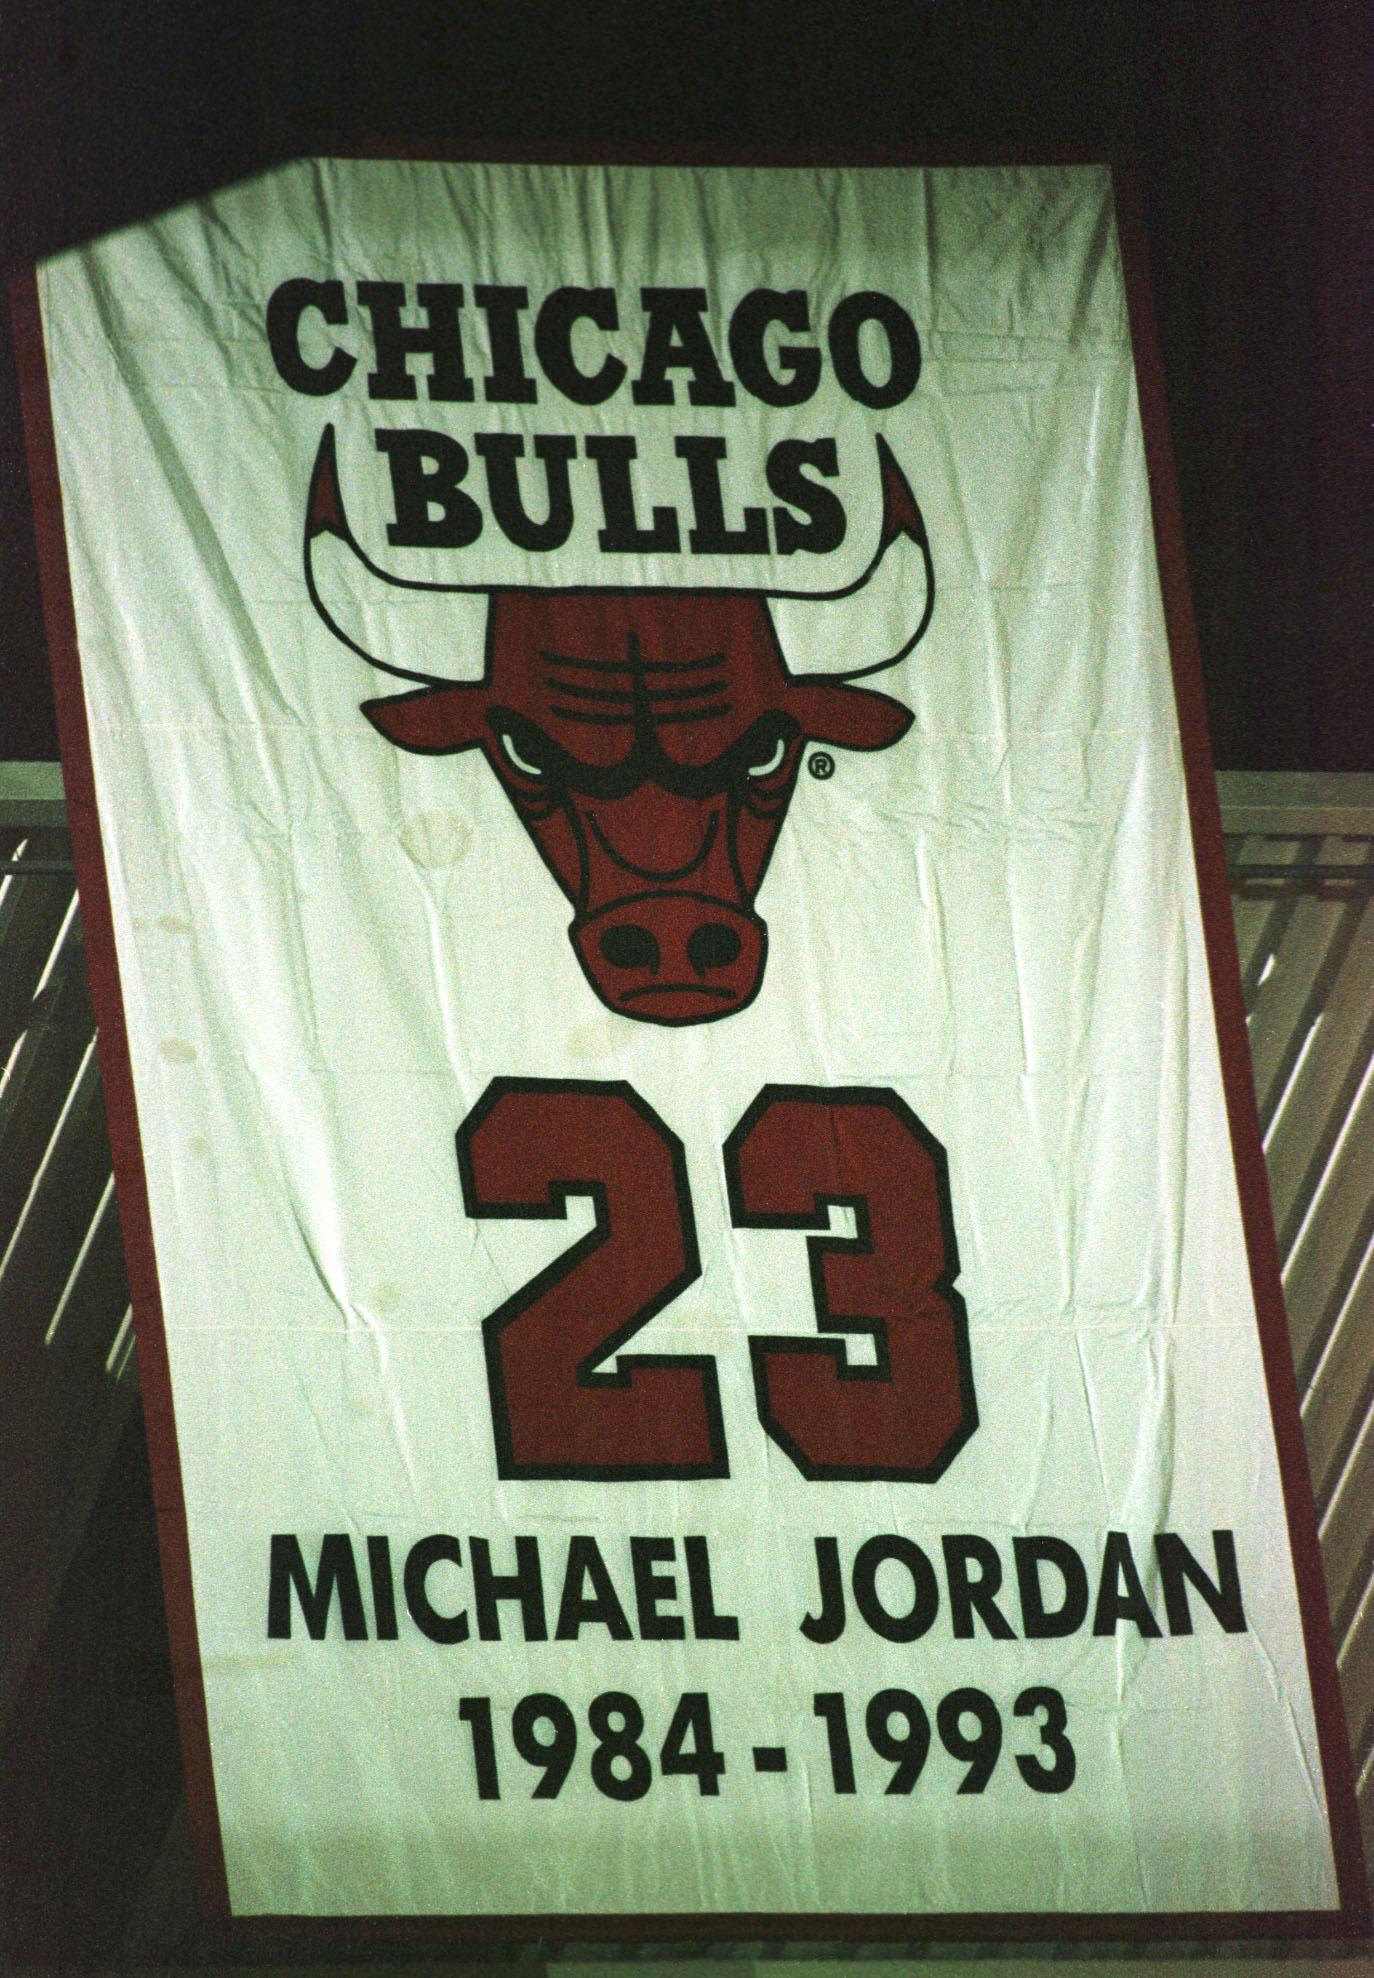 Exterior: Chicago Bulls History